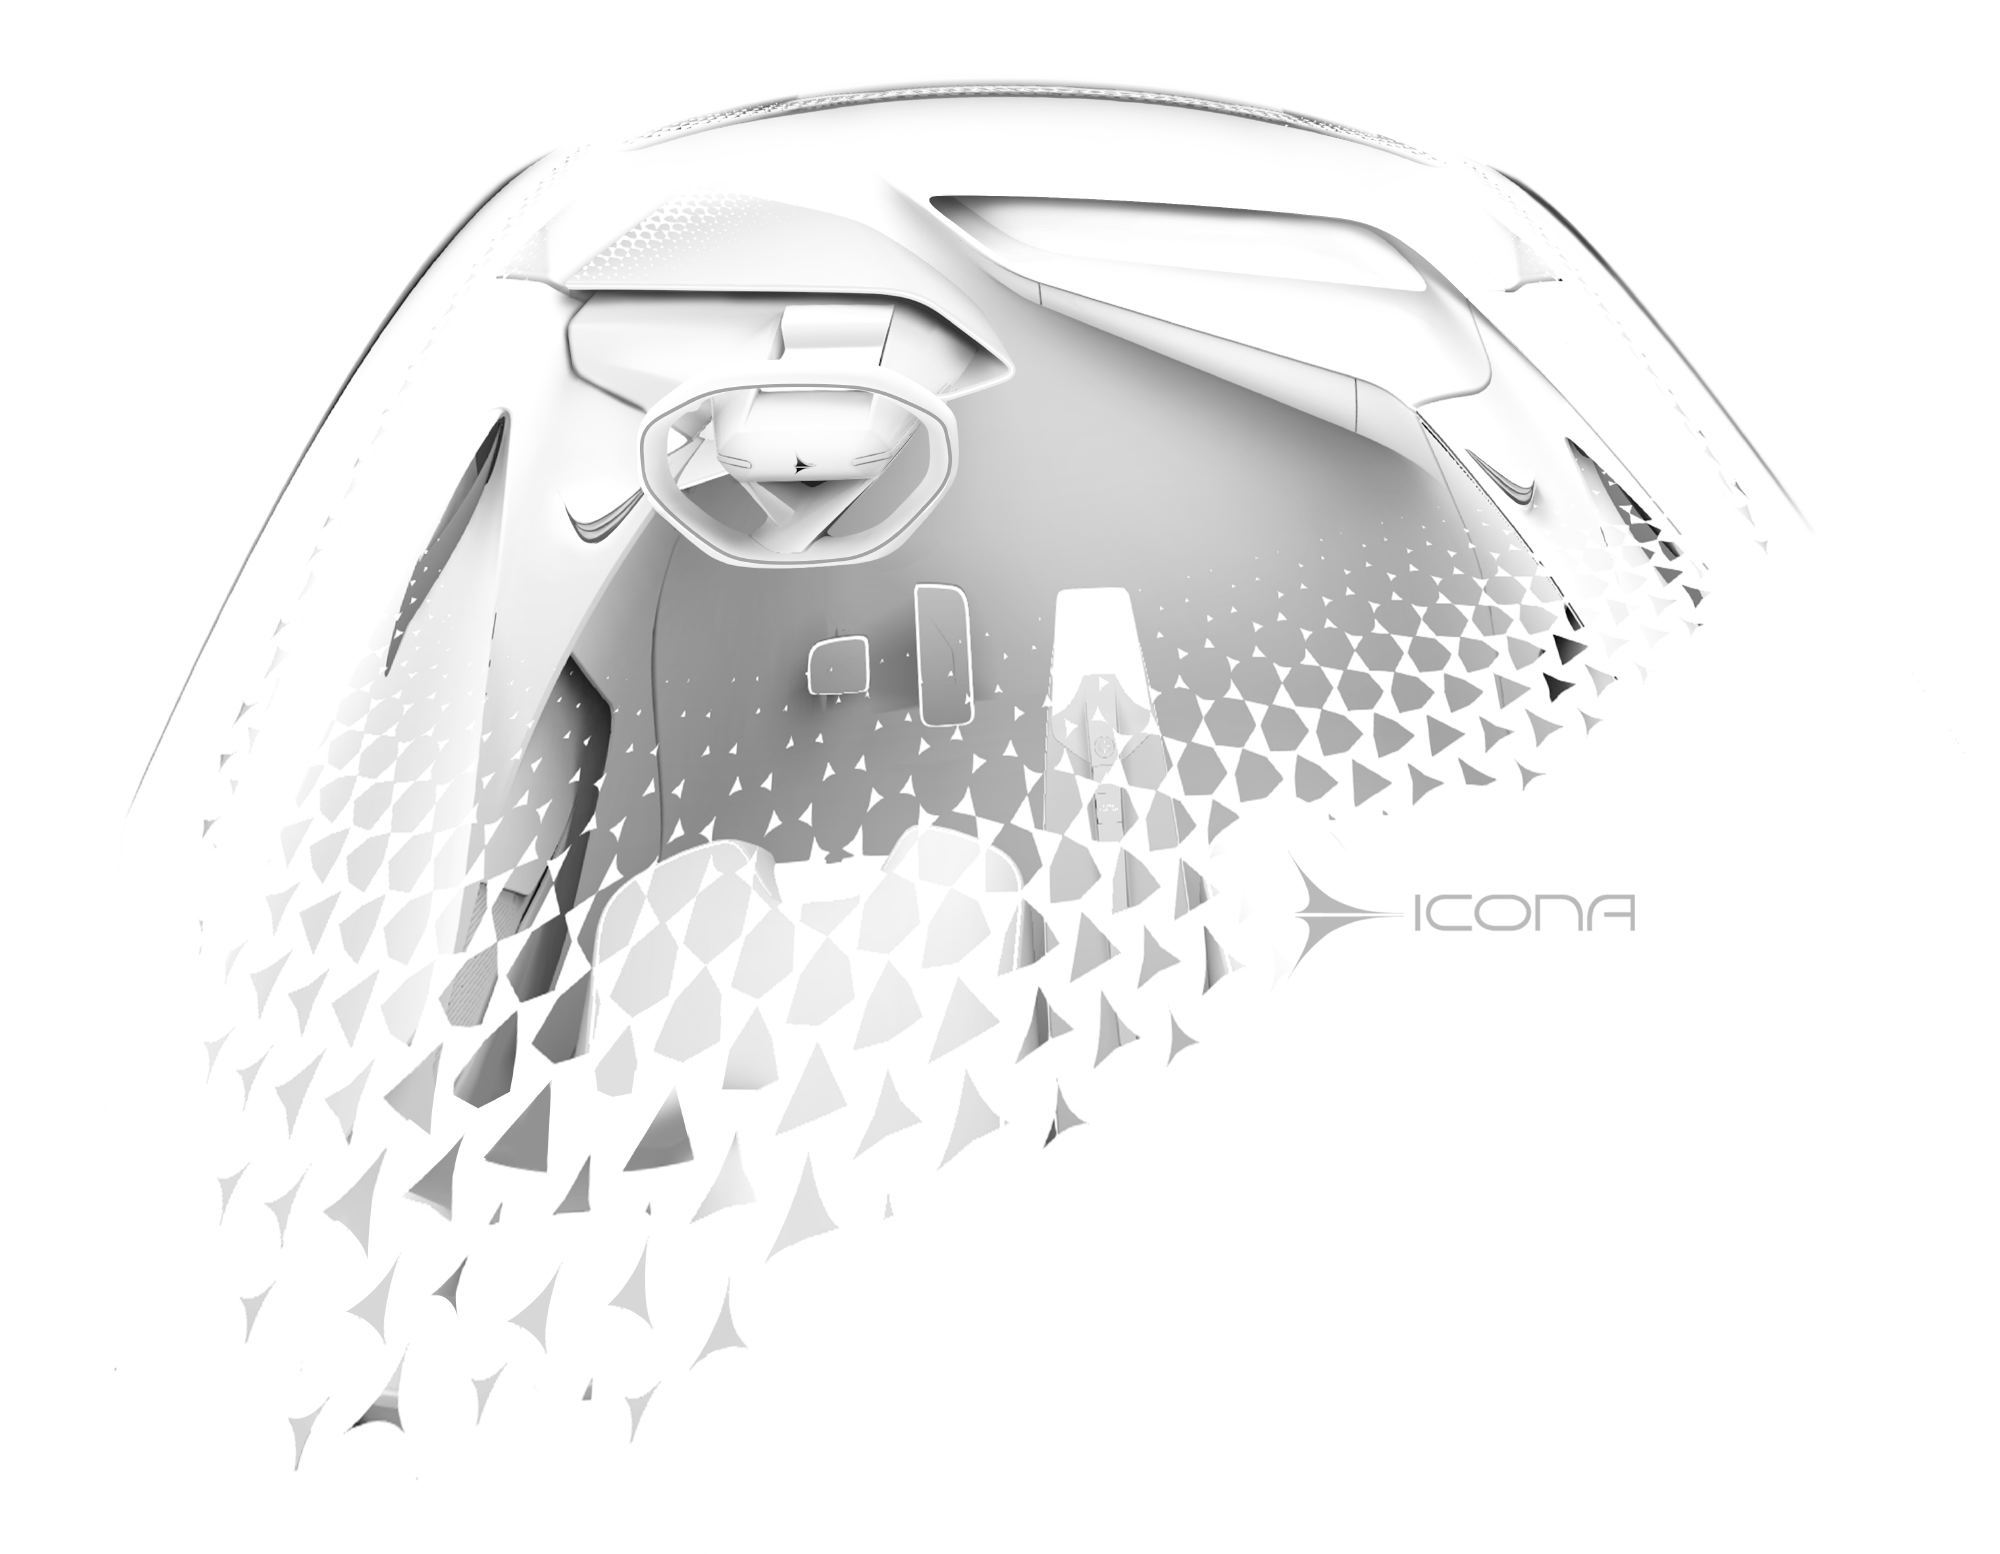 icona-design-01